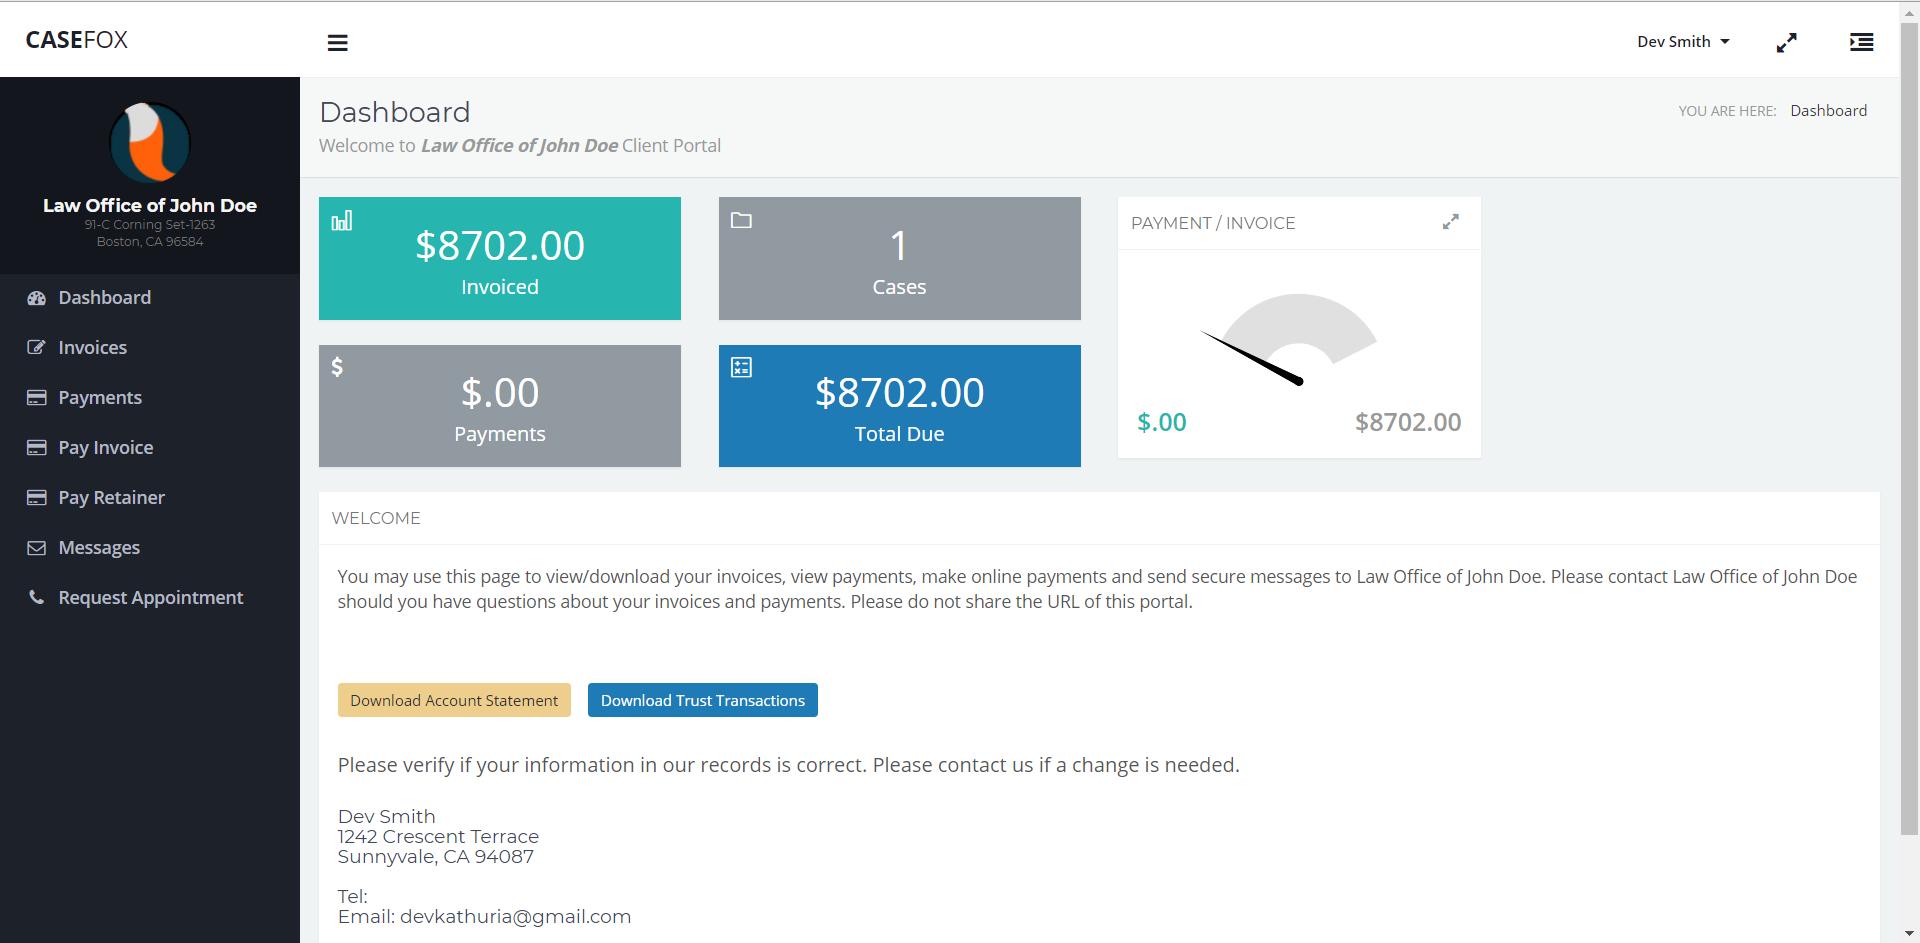 CaseFox Client Portal Dashboard